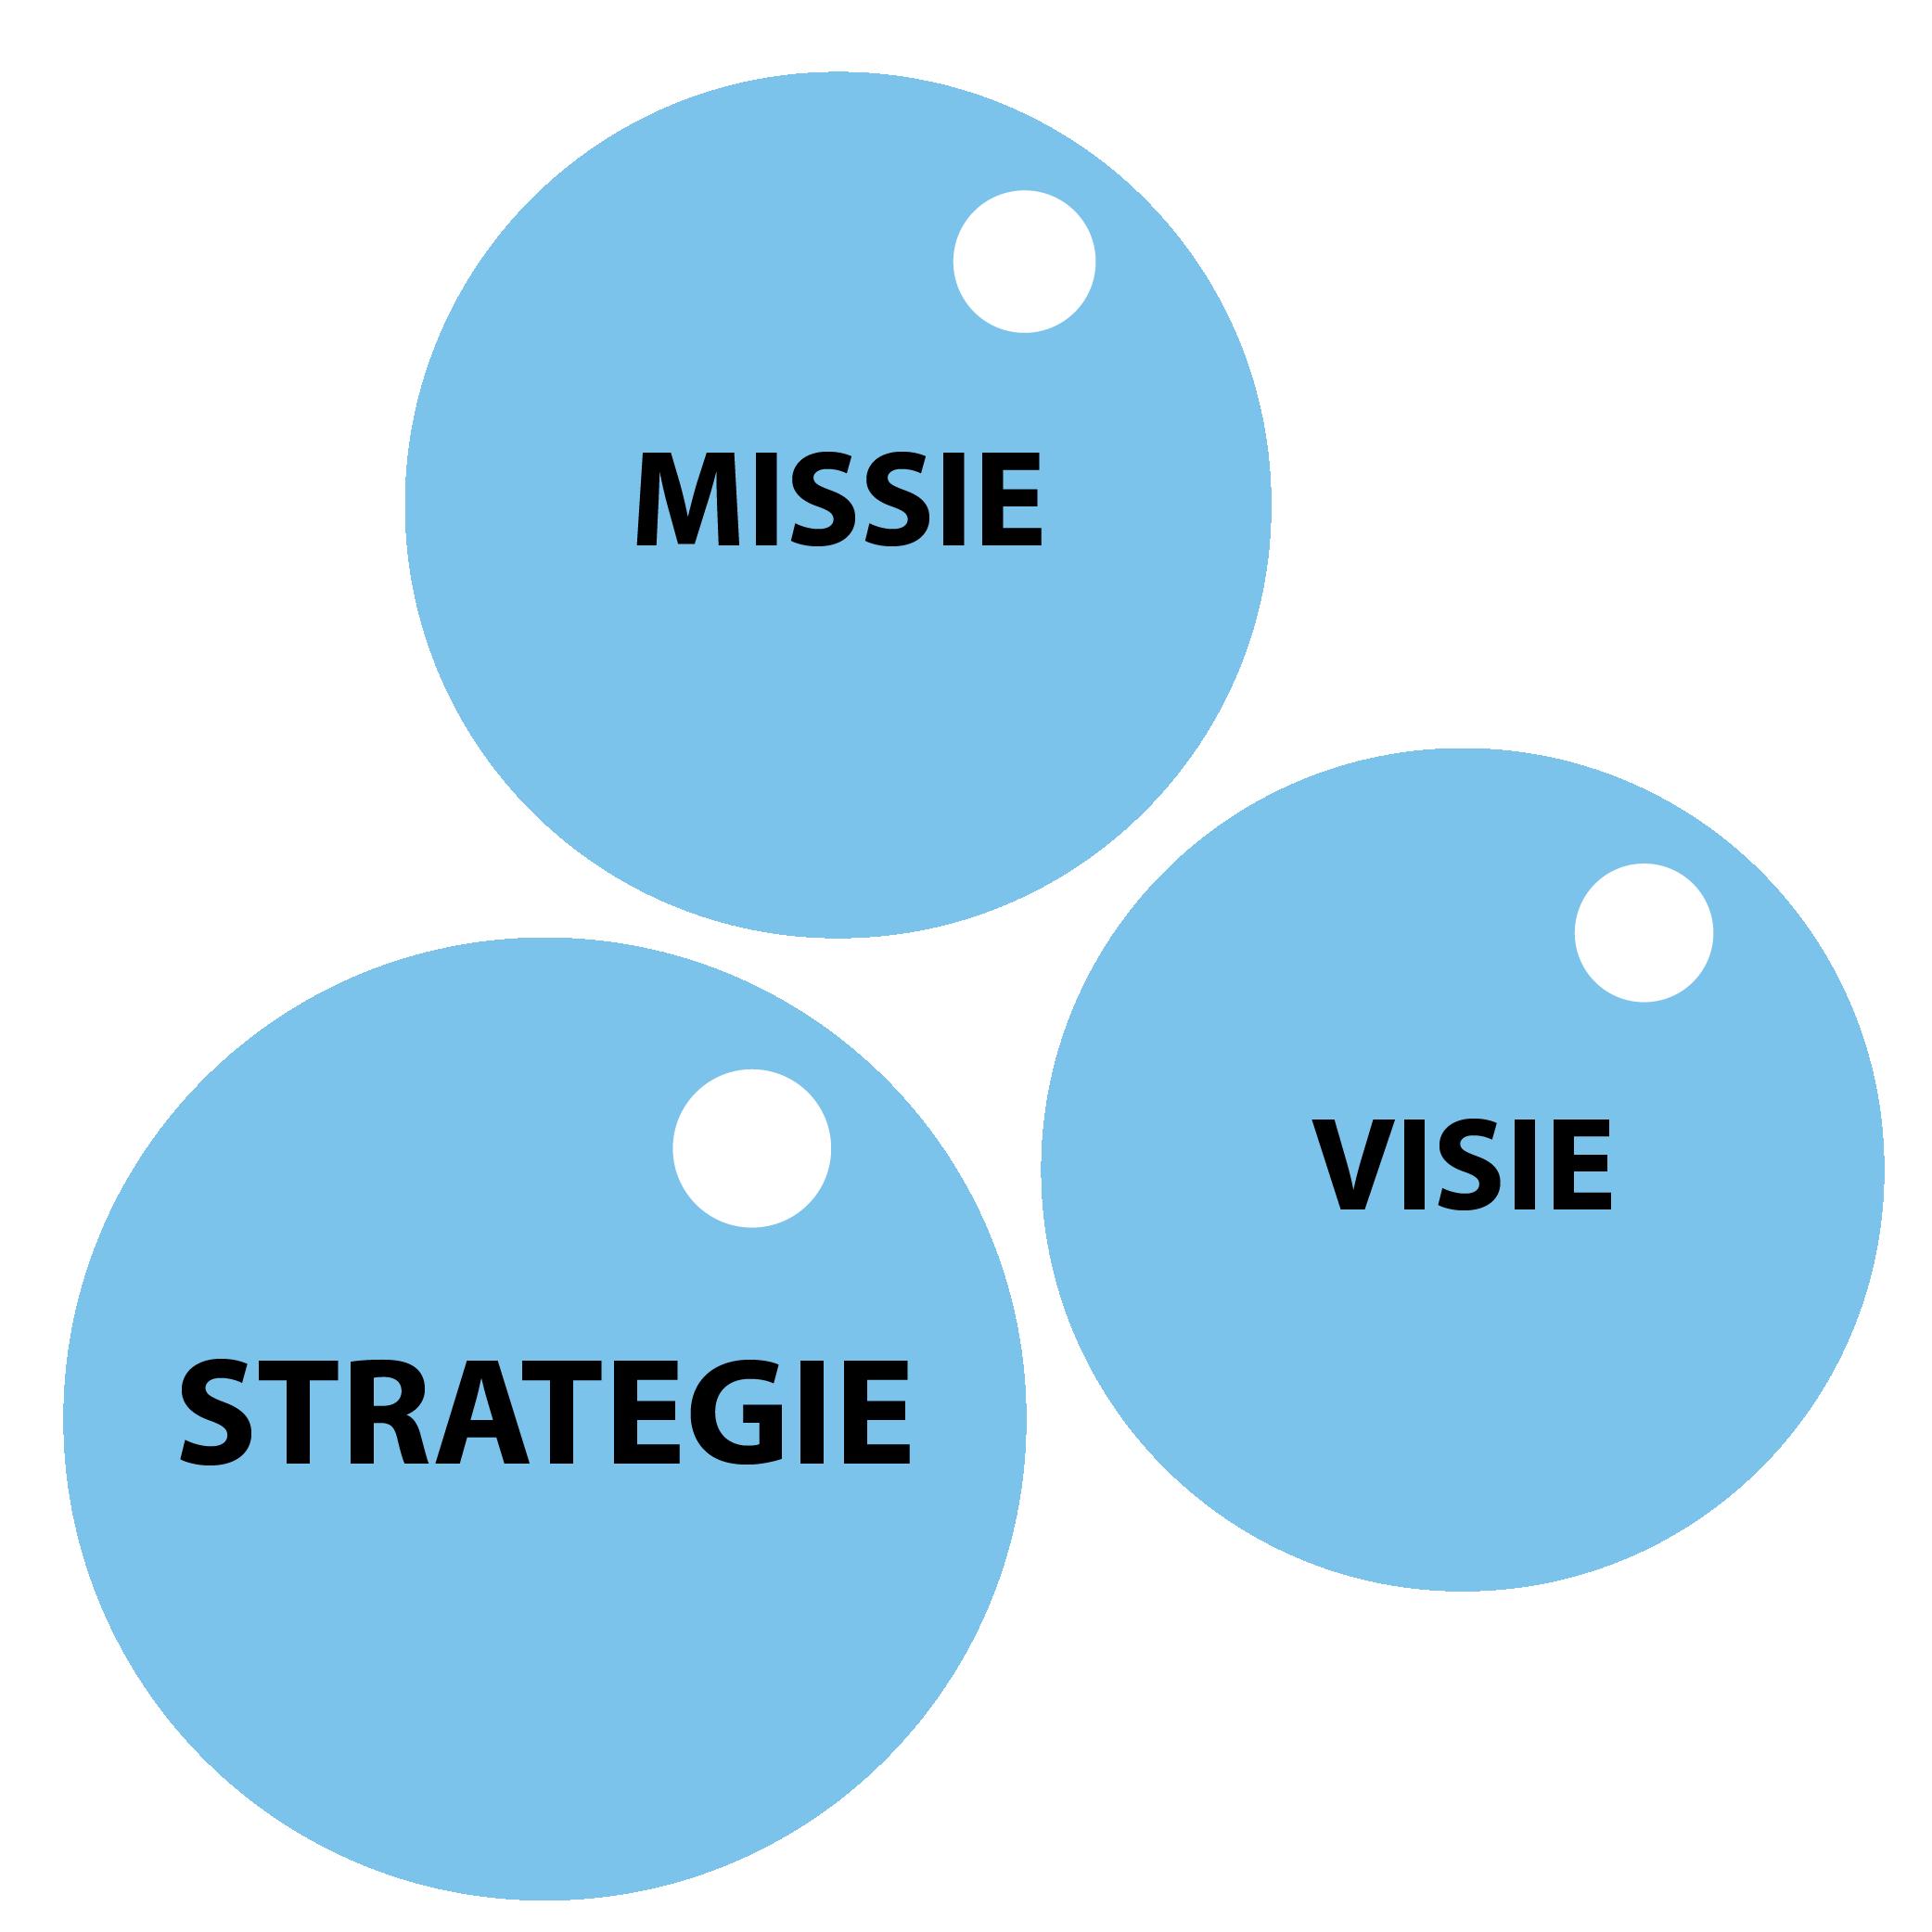 Missie_Visie_Strategie_2-01